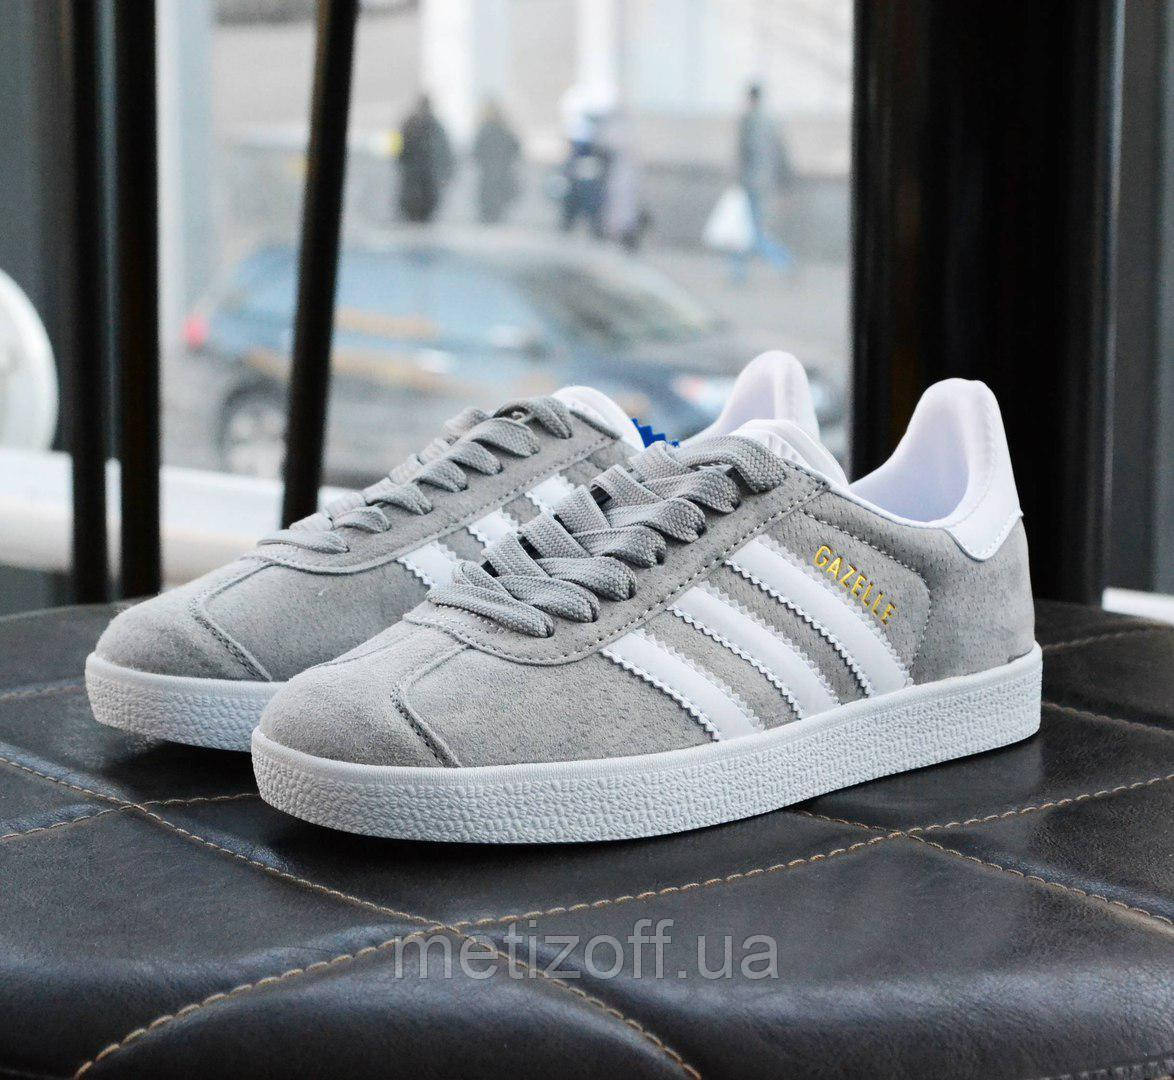 053fb53eb Женские кроссовки Adidas Gazelle Light Grey/White (реплика): продажа ...